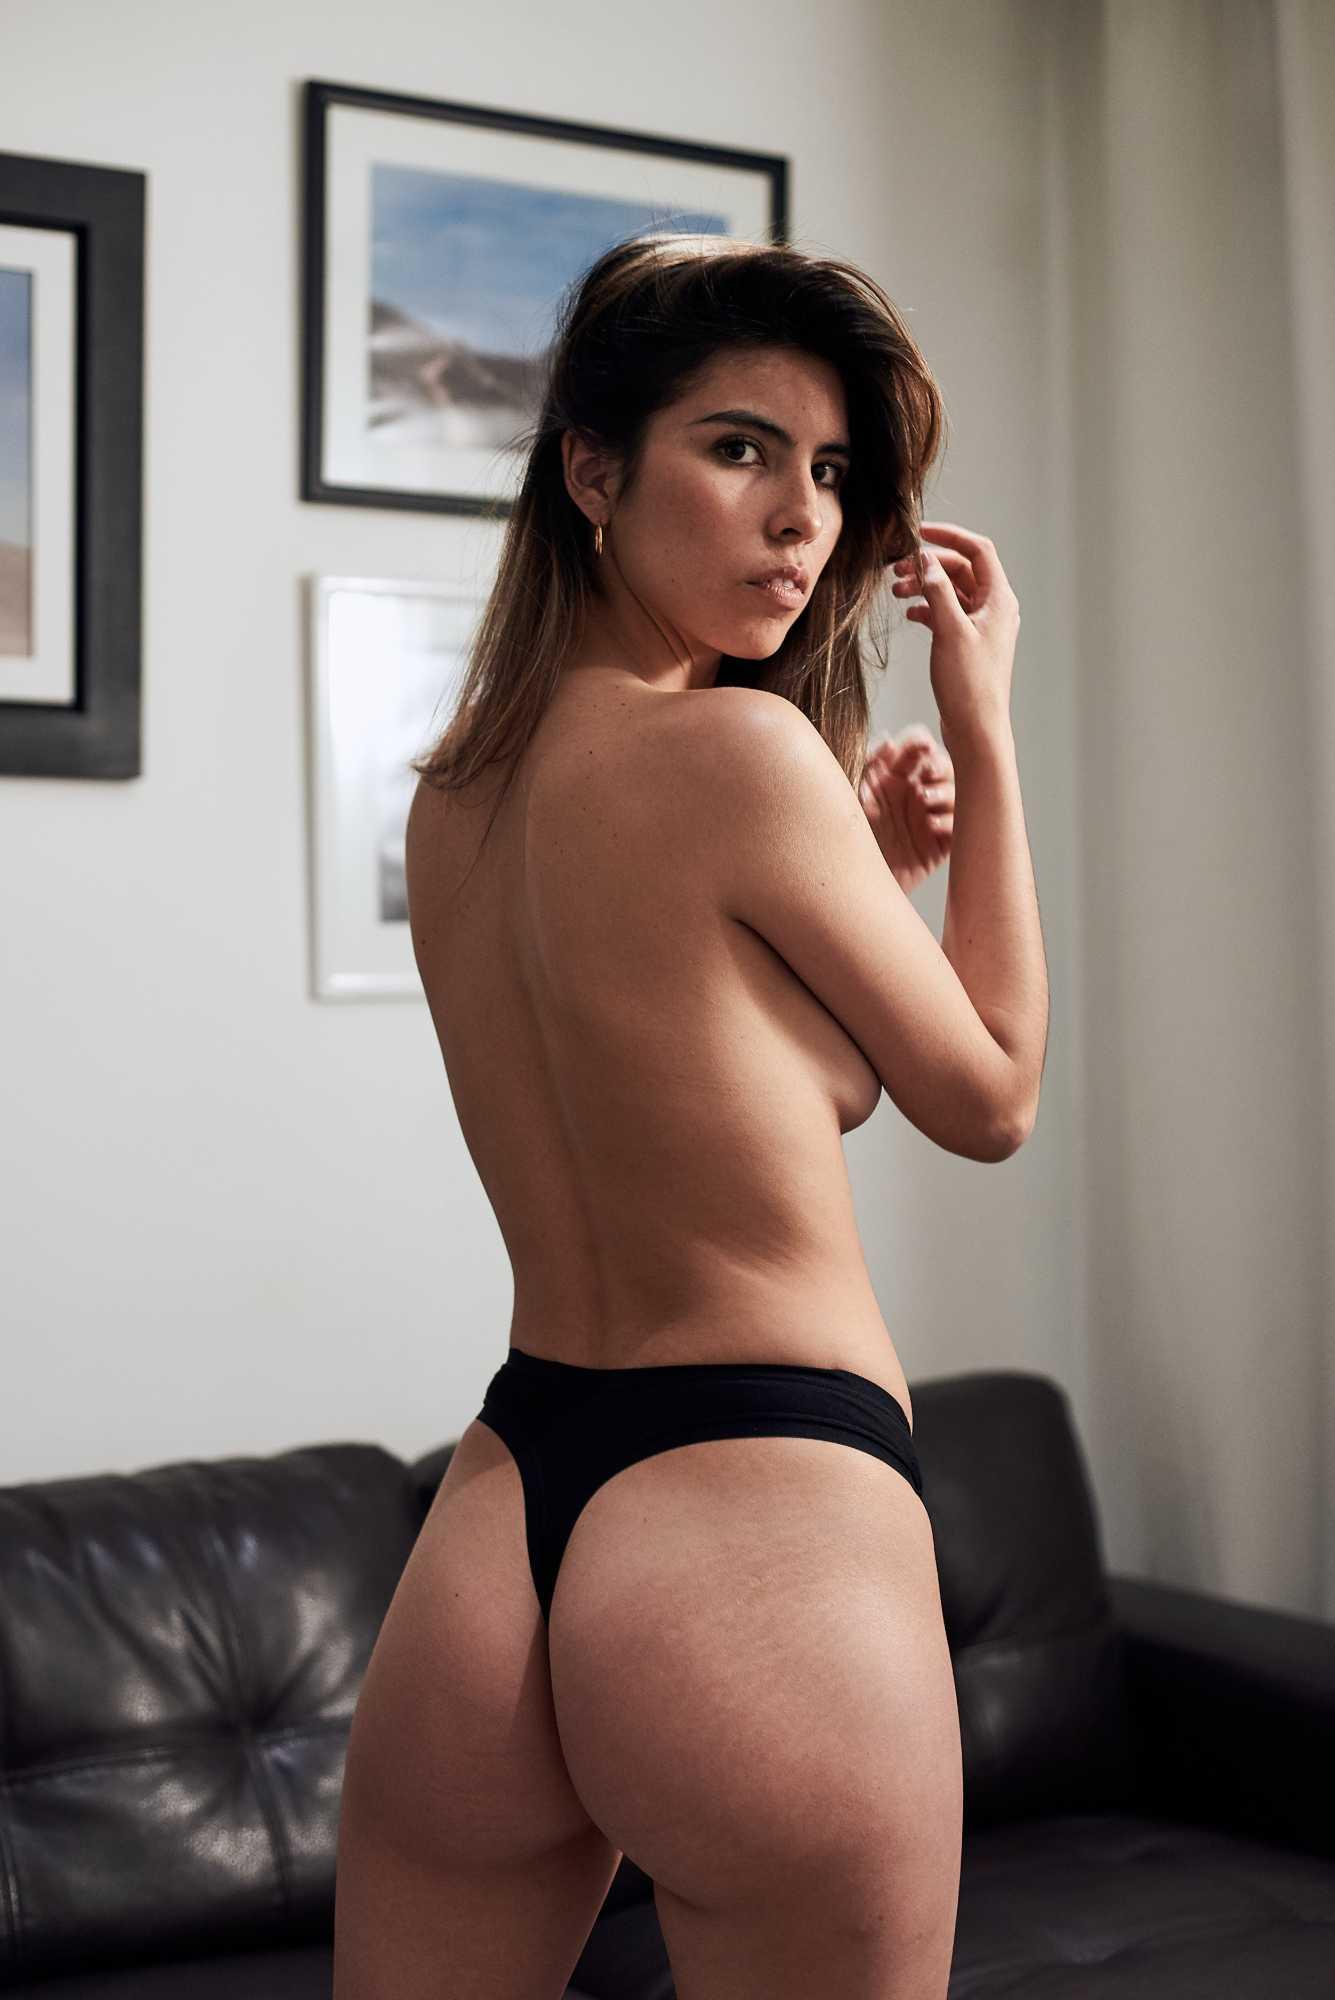 Mireya Orellana - Joseph Sifuentes photoshoot